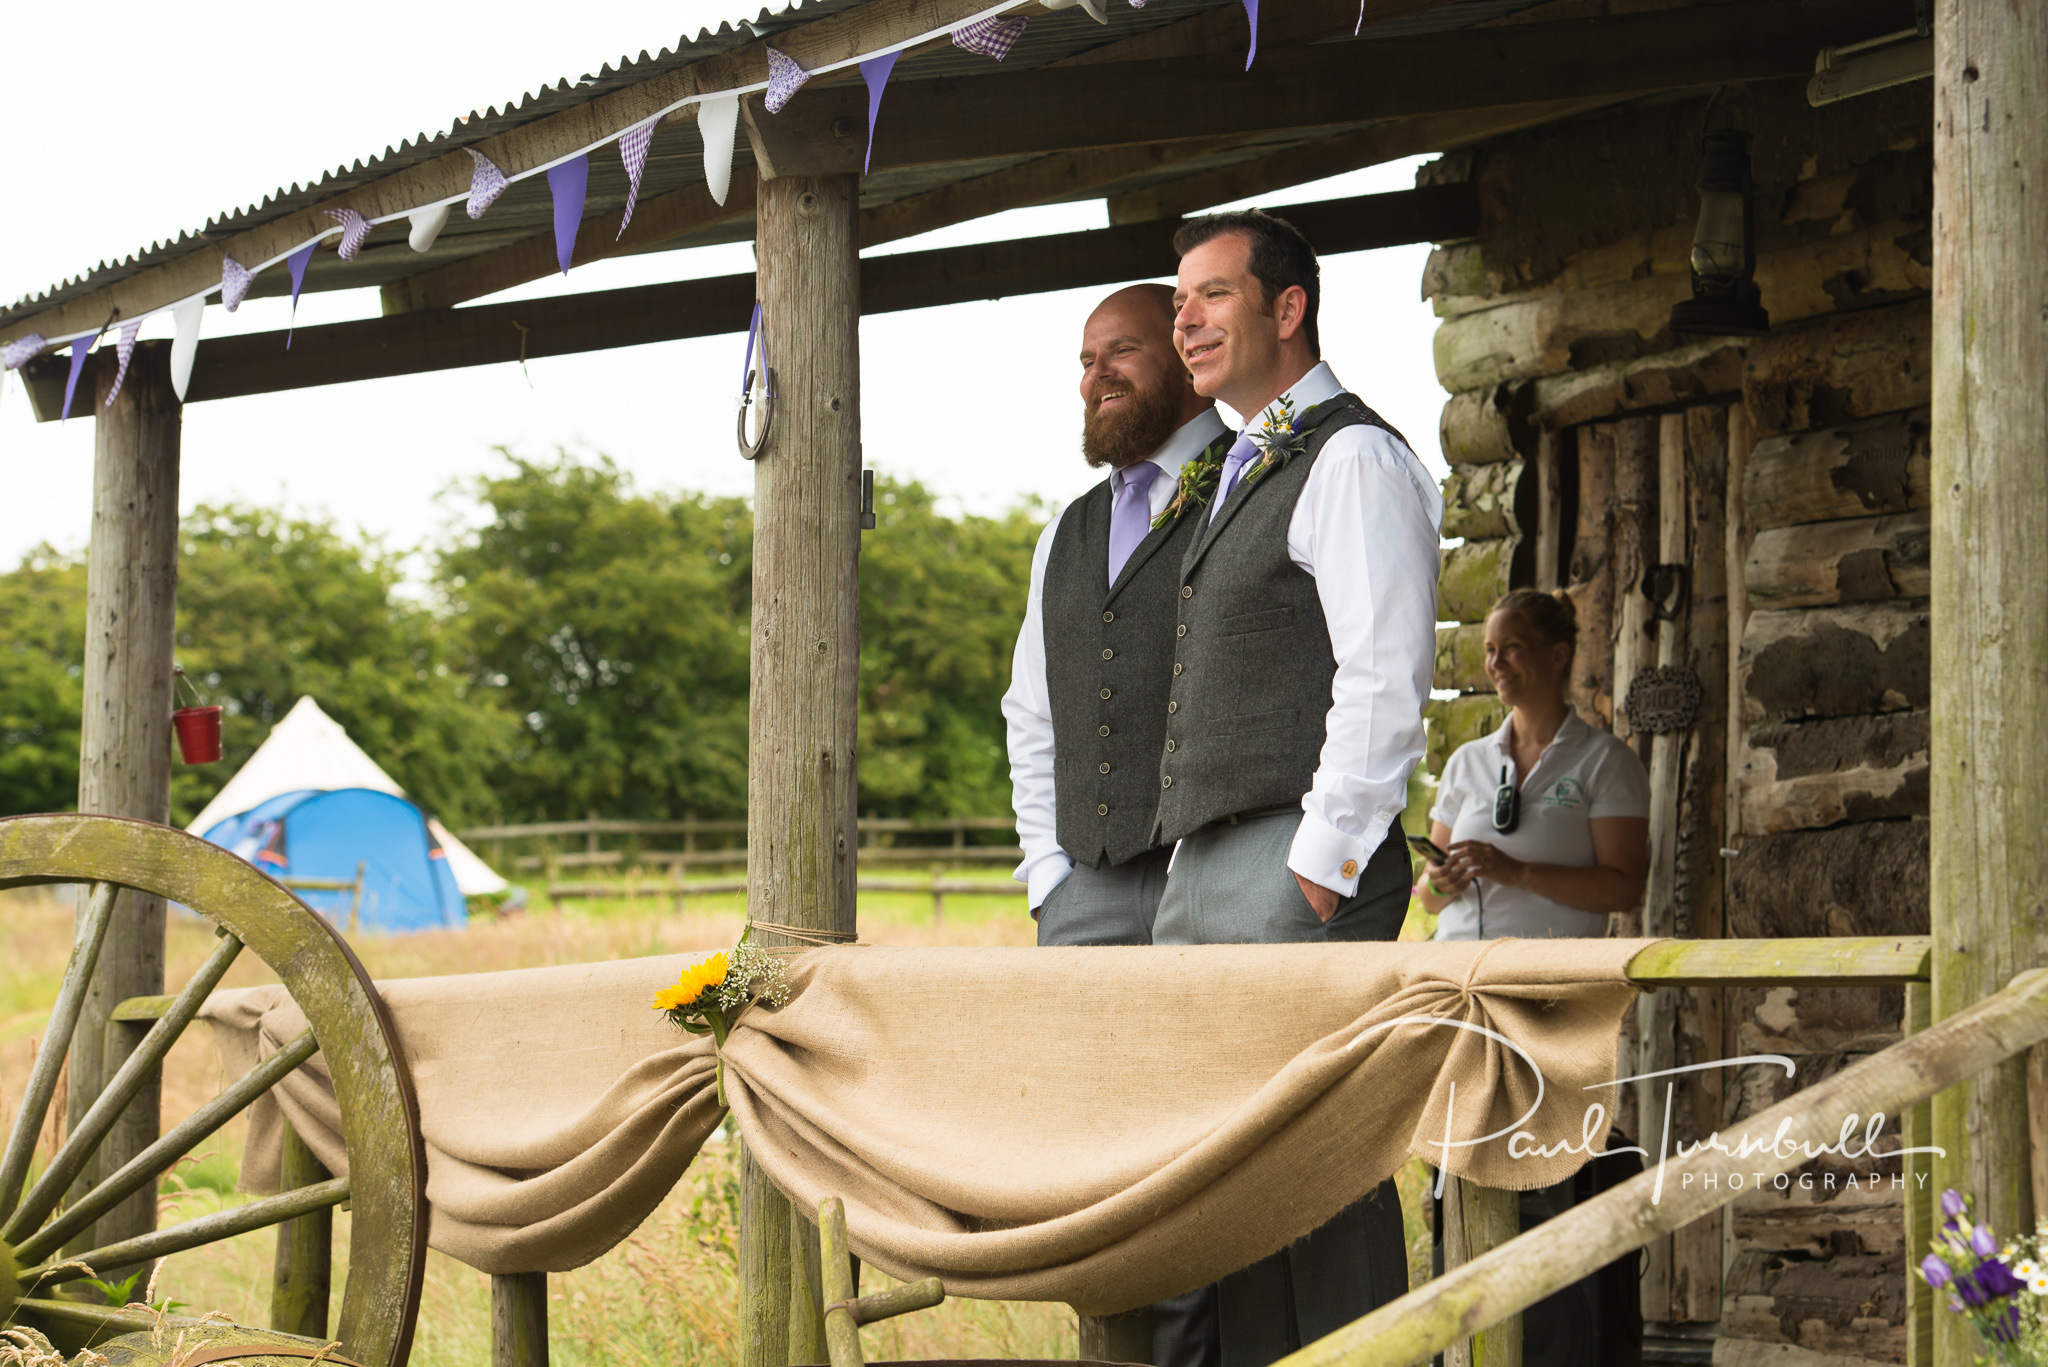 wedding-photographer-hilltop-farm-ilton-yorkshire-005.jpg